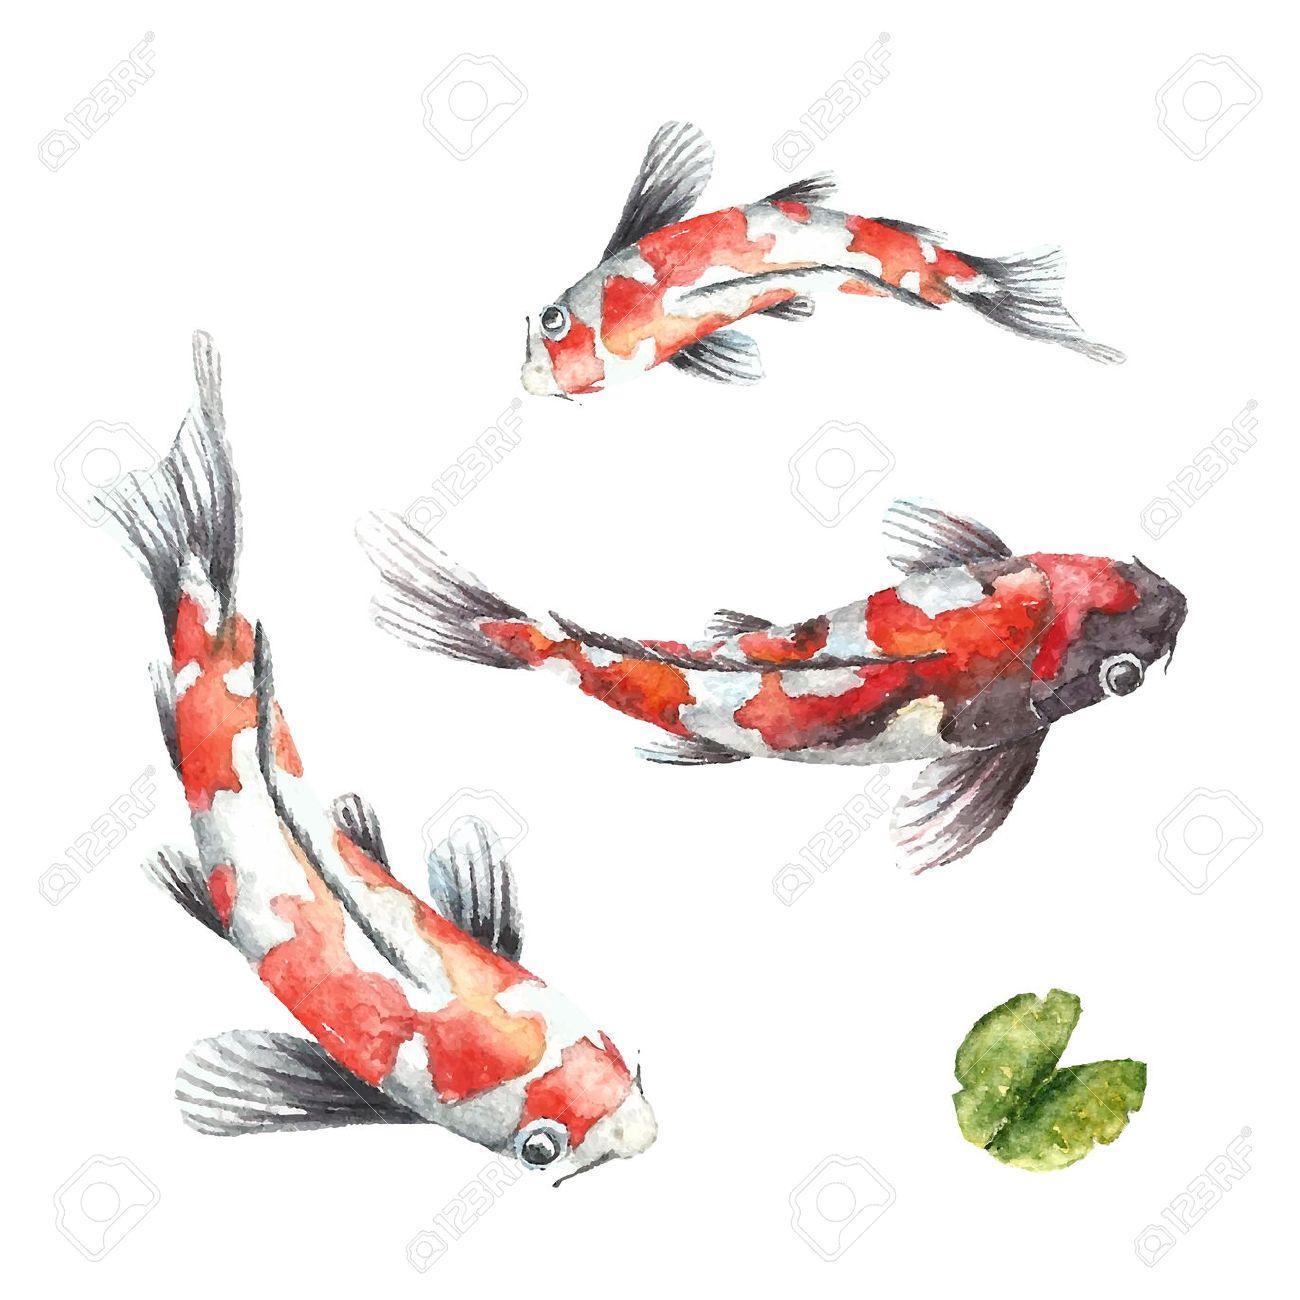 acuarela carpas koi rojo mano aislada dibujar peces del vector foto de